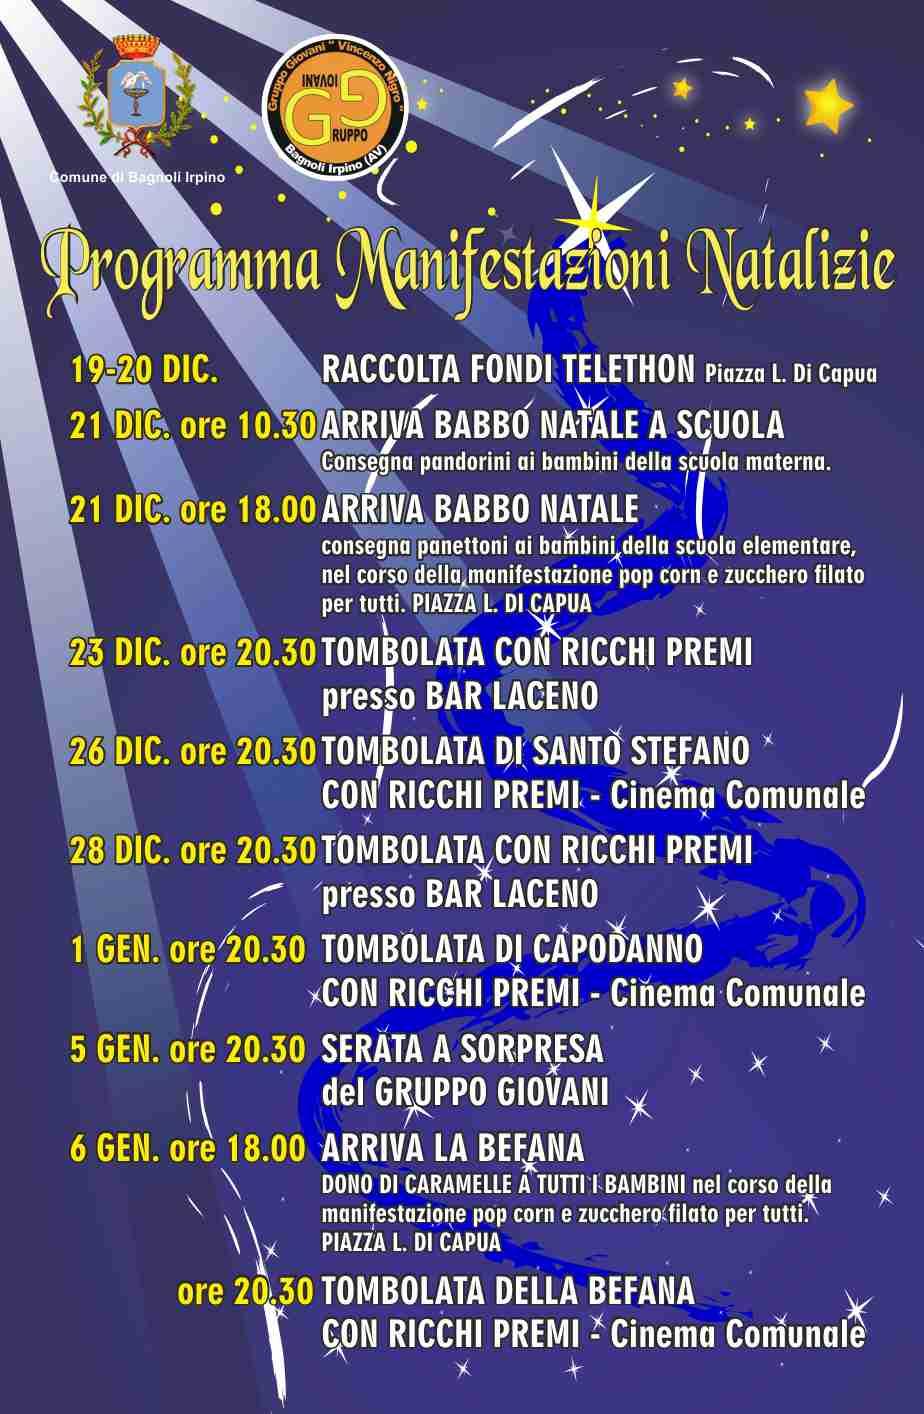 locandina-natale-giovani-2015